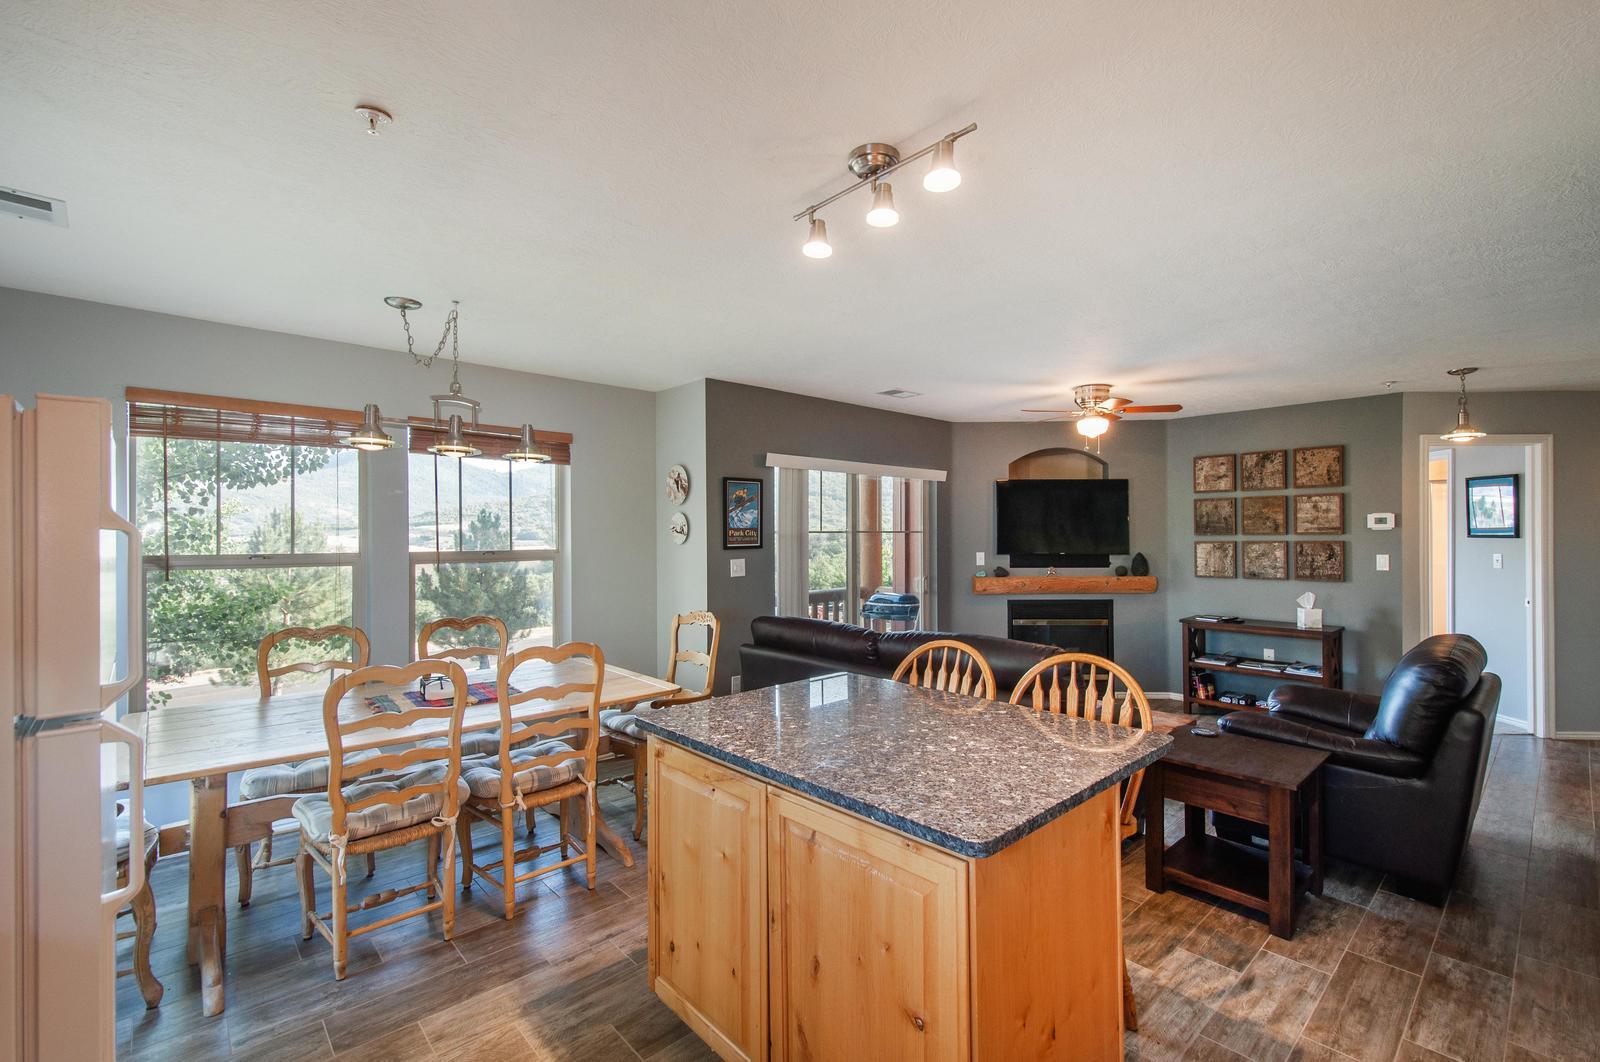 Open kitchen and living room floorplan